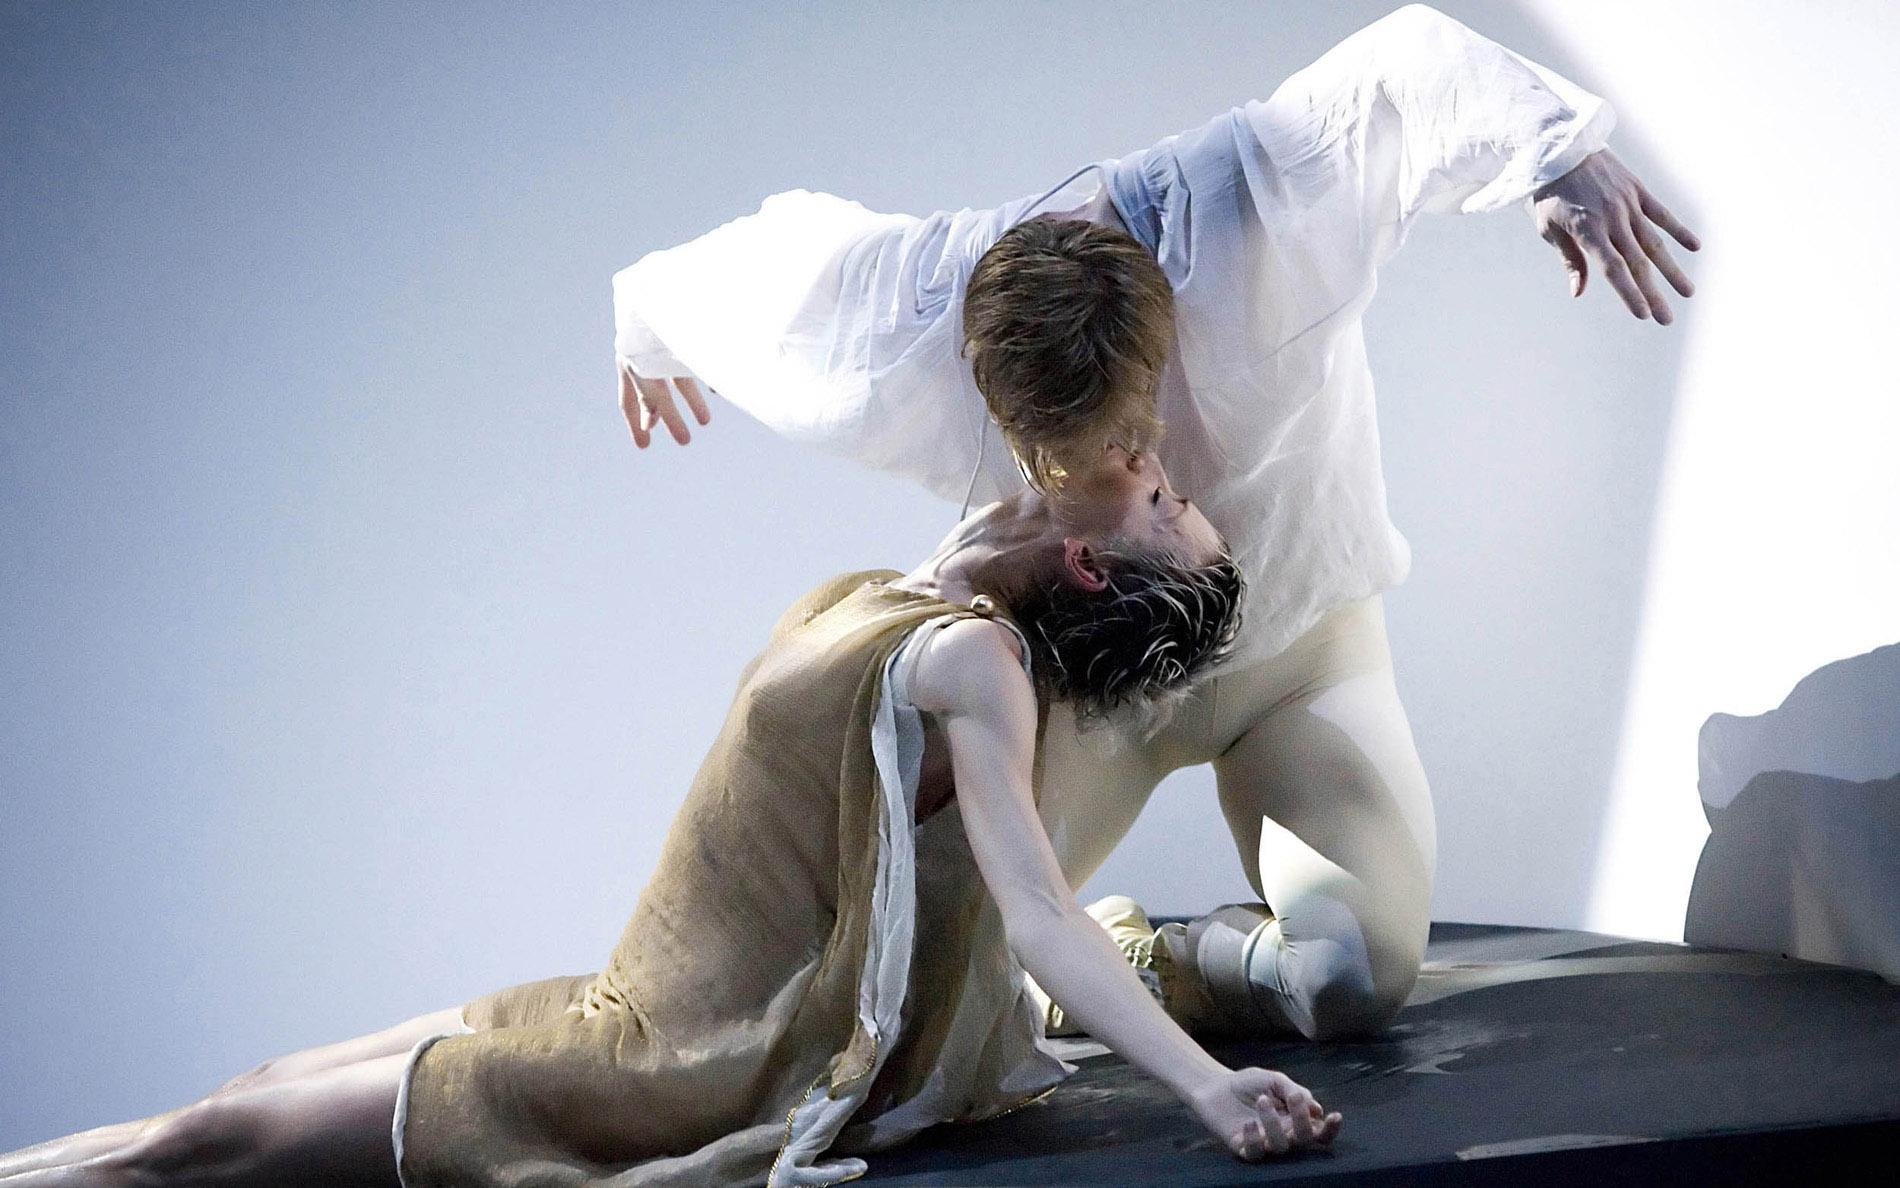 iberarte-giras-act-RomeoyJulieta